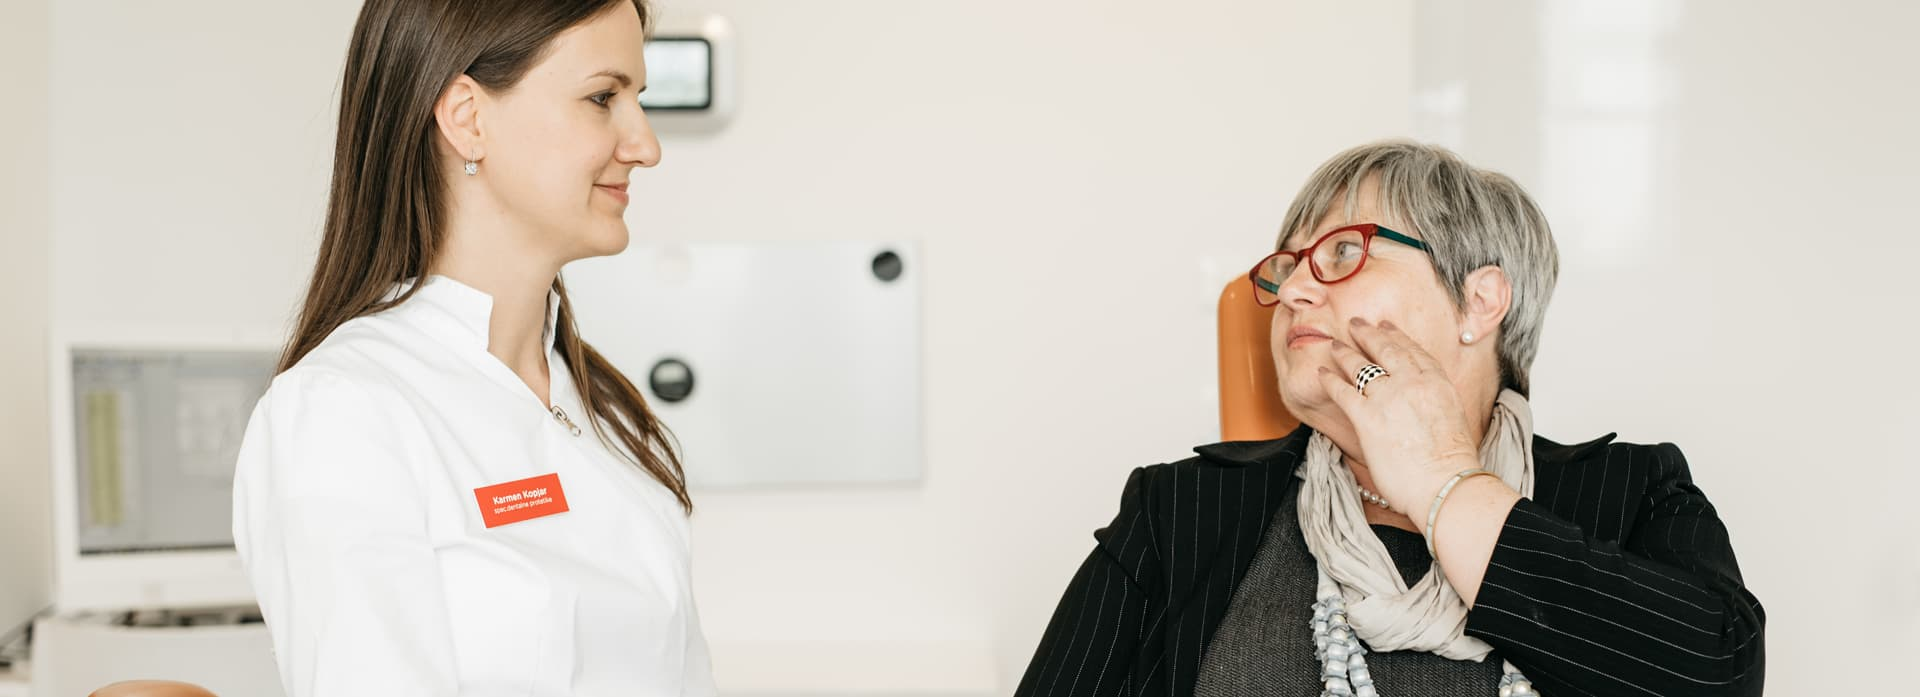 Parodontologia Croazia - Centro Dentale Štimac